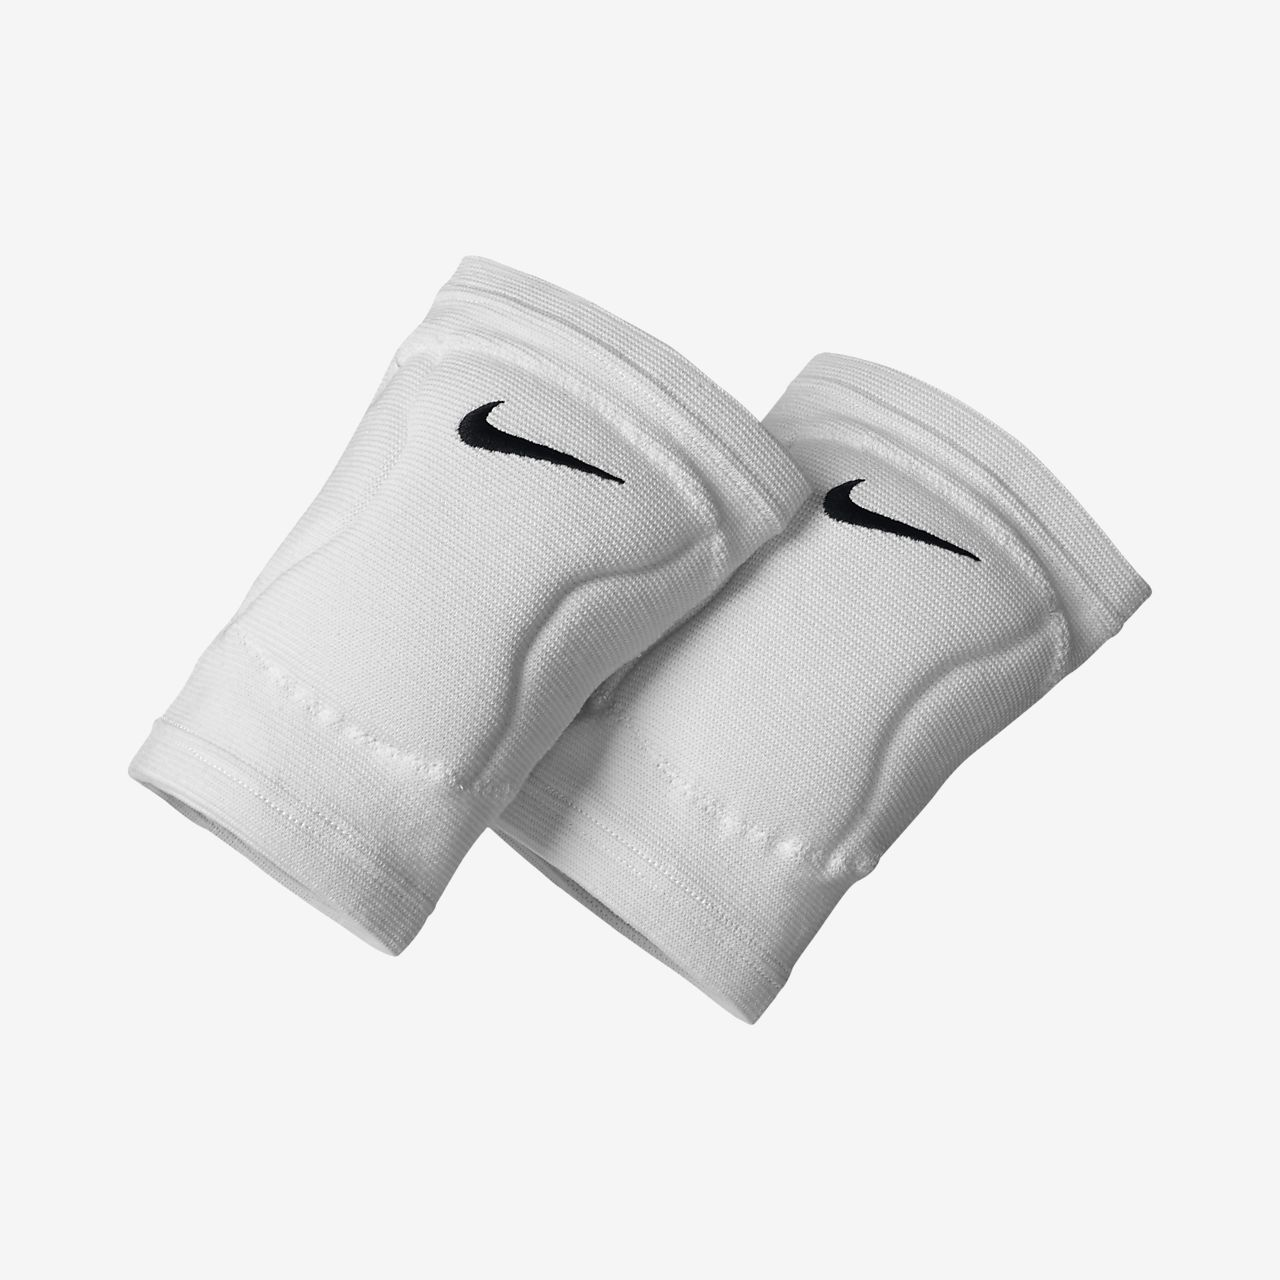 Nike Streak Volleyball Knee Pads Nike Com Volleyball Knee Pads Knee Pads Volleyball Shoes